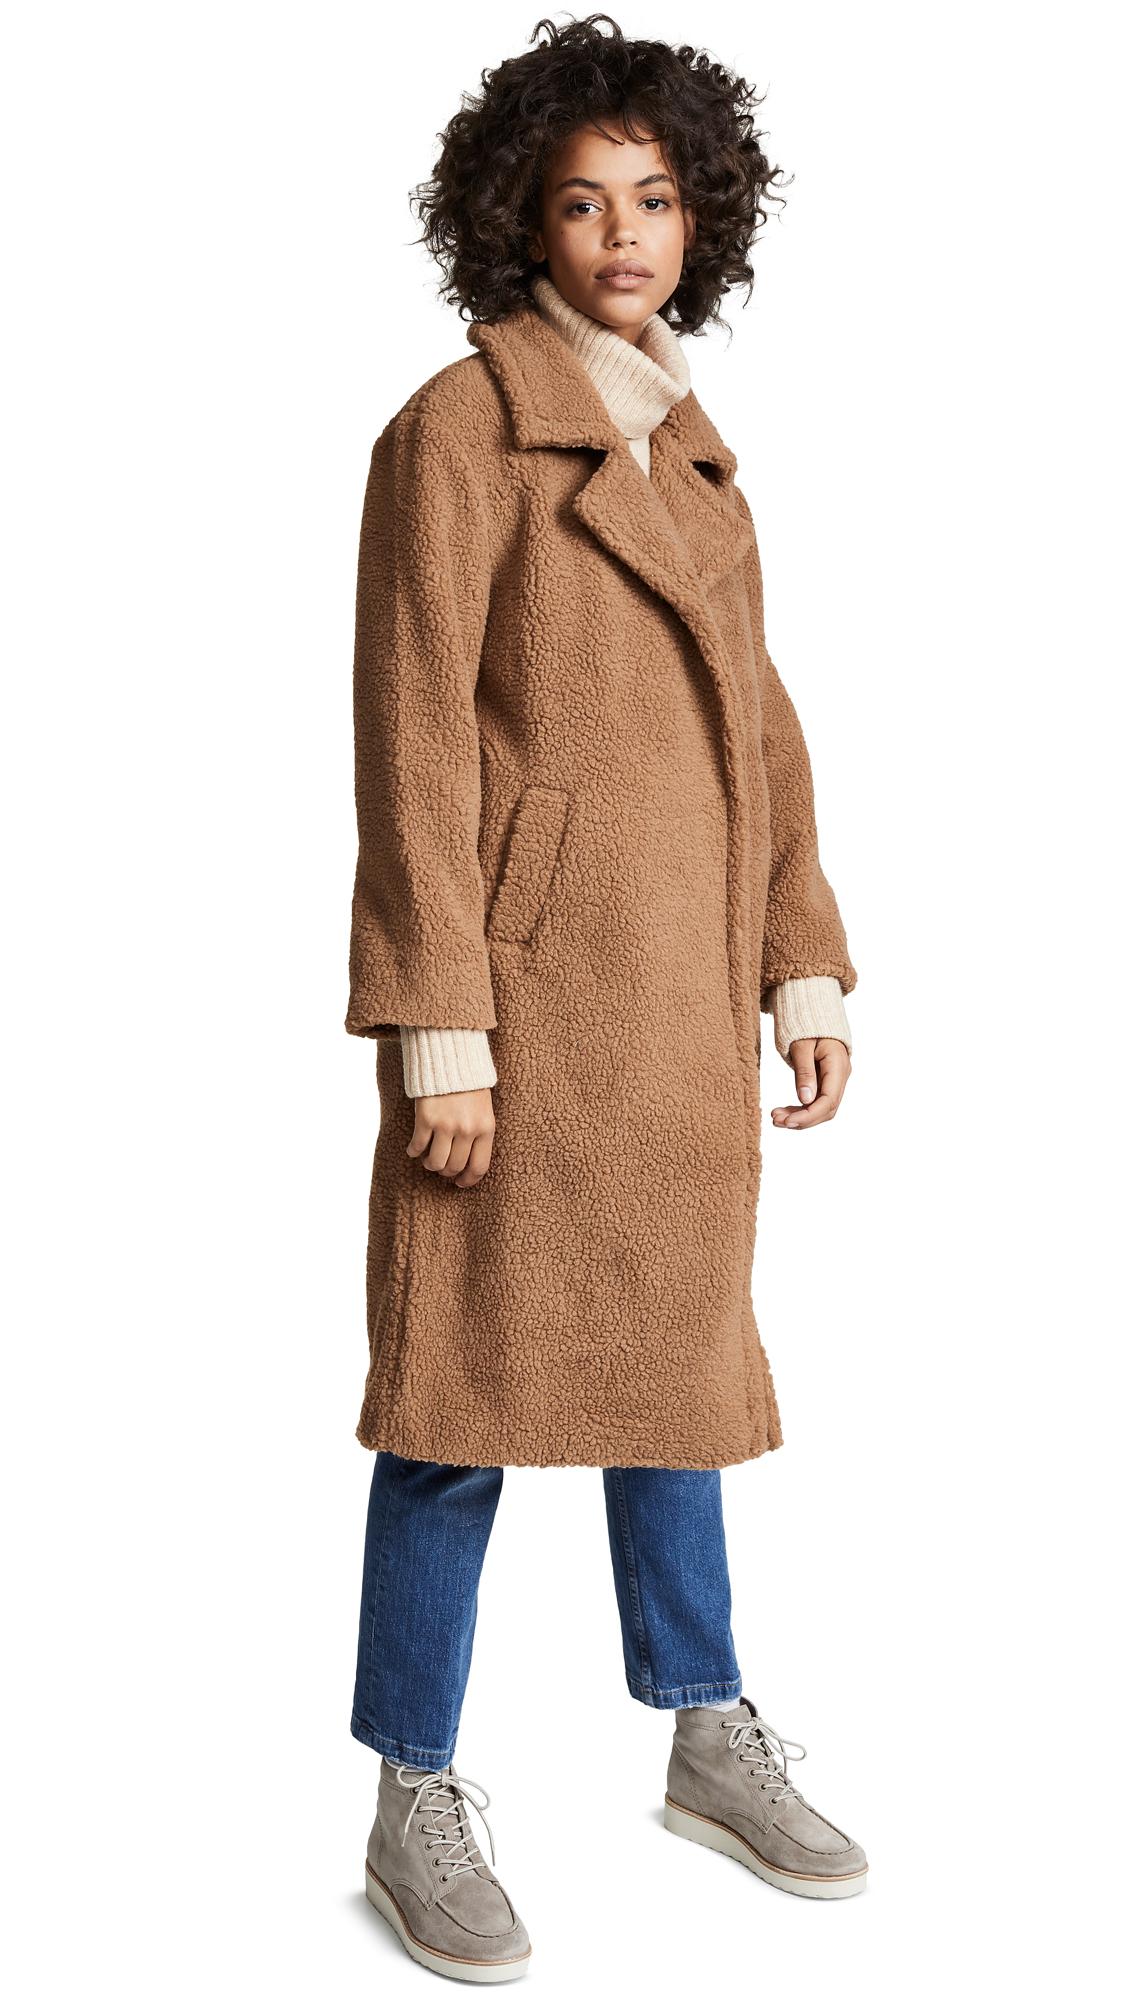 JOA Teddy Coat in Latte